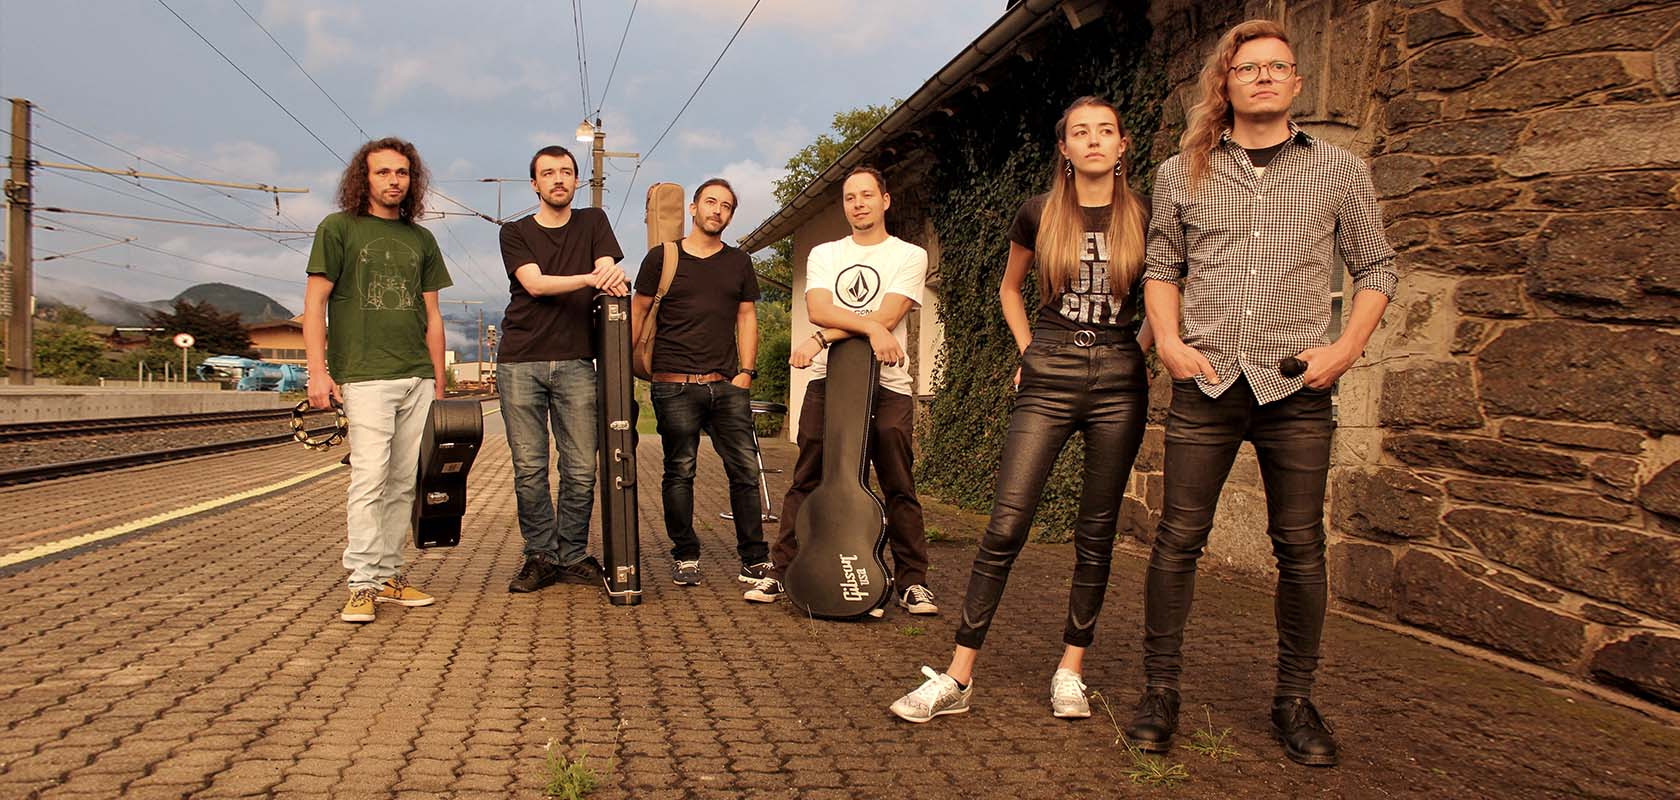 Rockband in der AREA 47